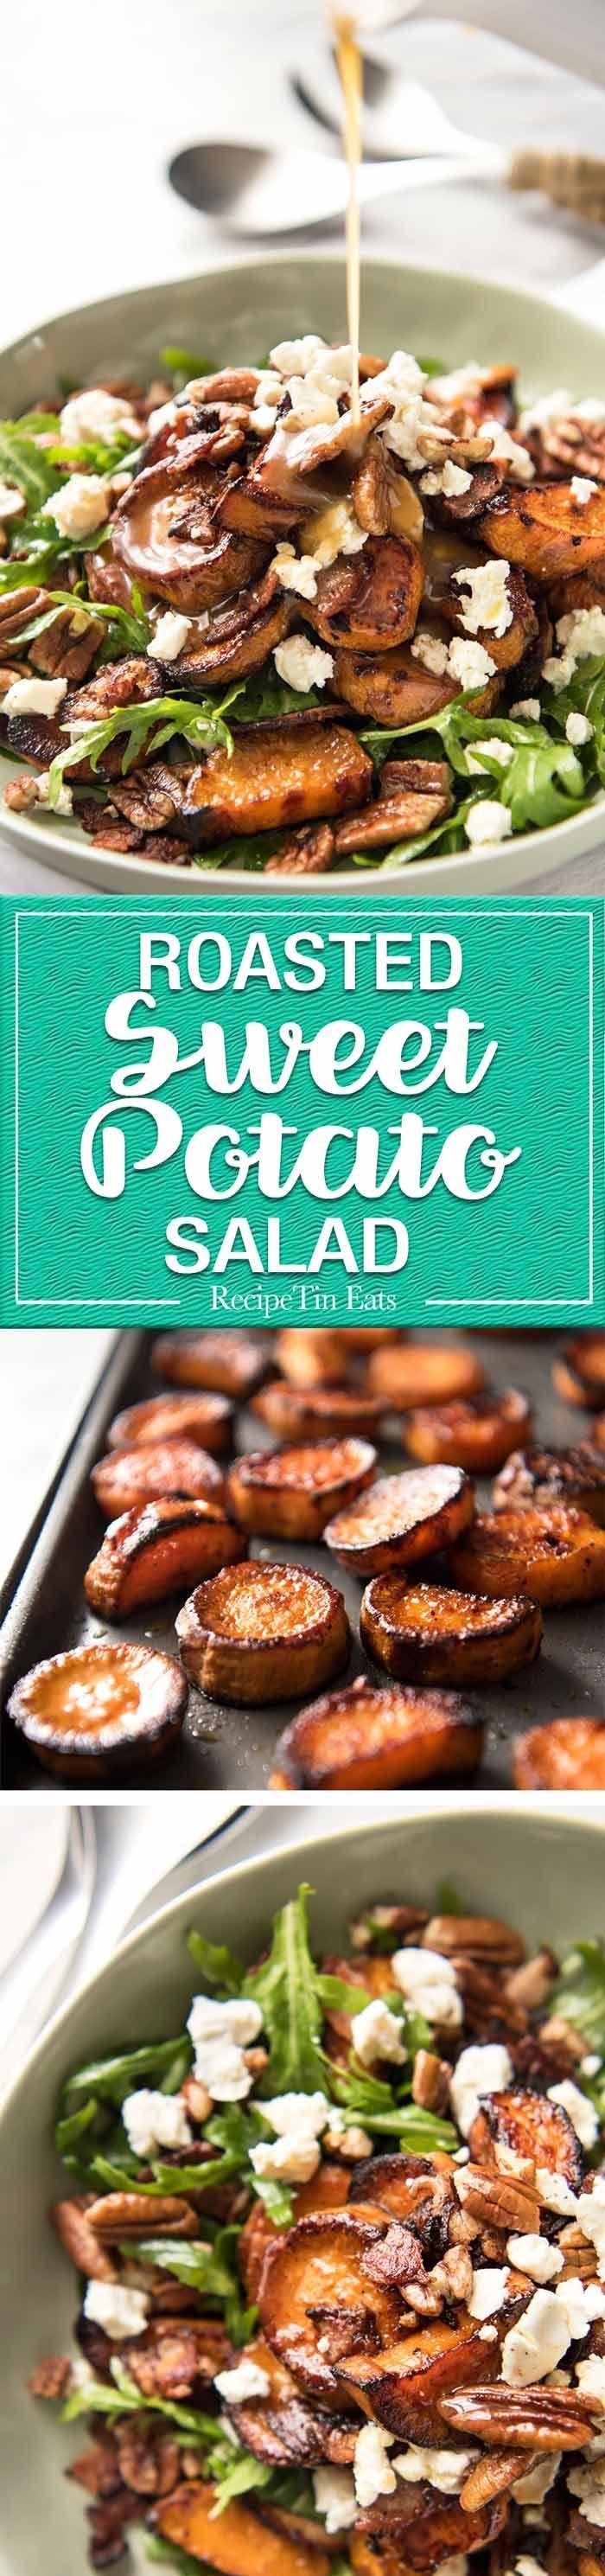 Roasted Sweet Potato Salad ~ combination of arugula/rocket, pecans, goats cheese or feta, a sprinkle of bacon and a beautiful honey lemon dressing!